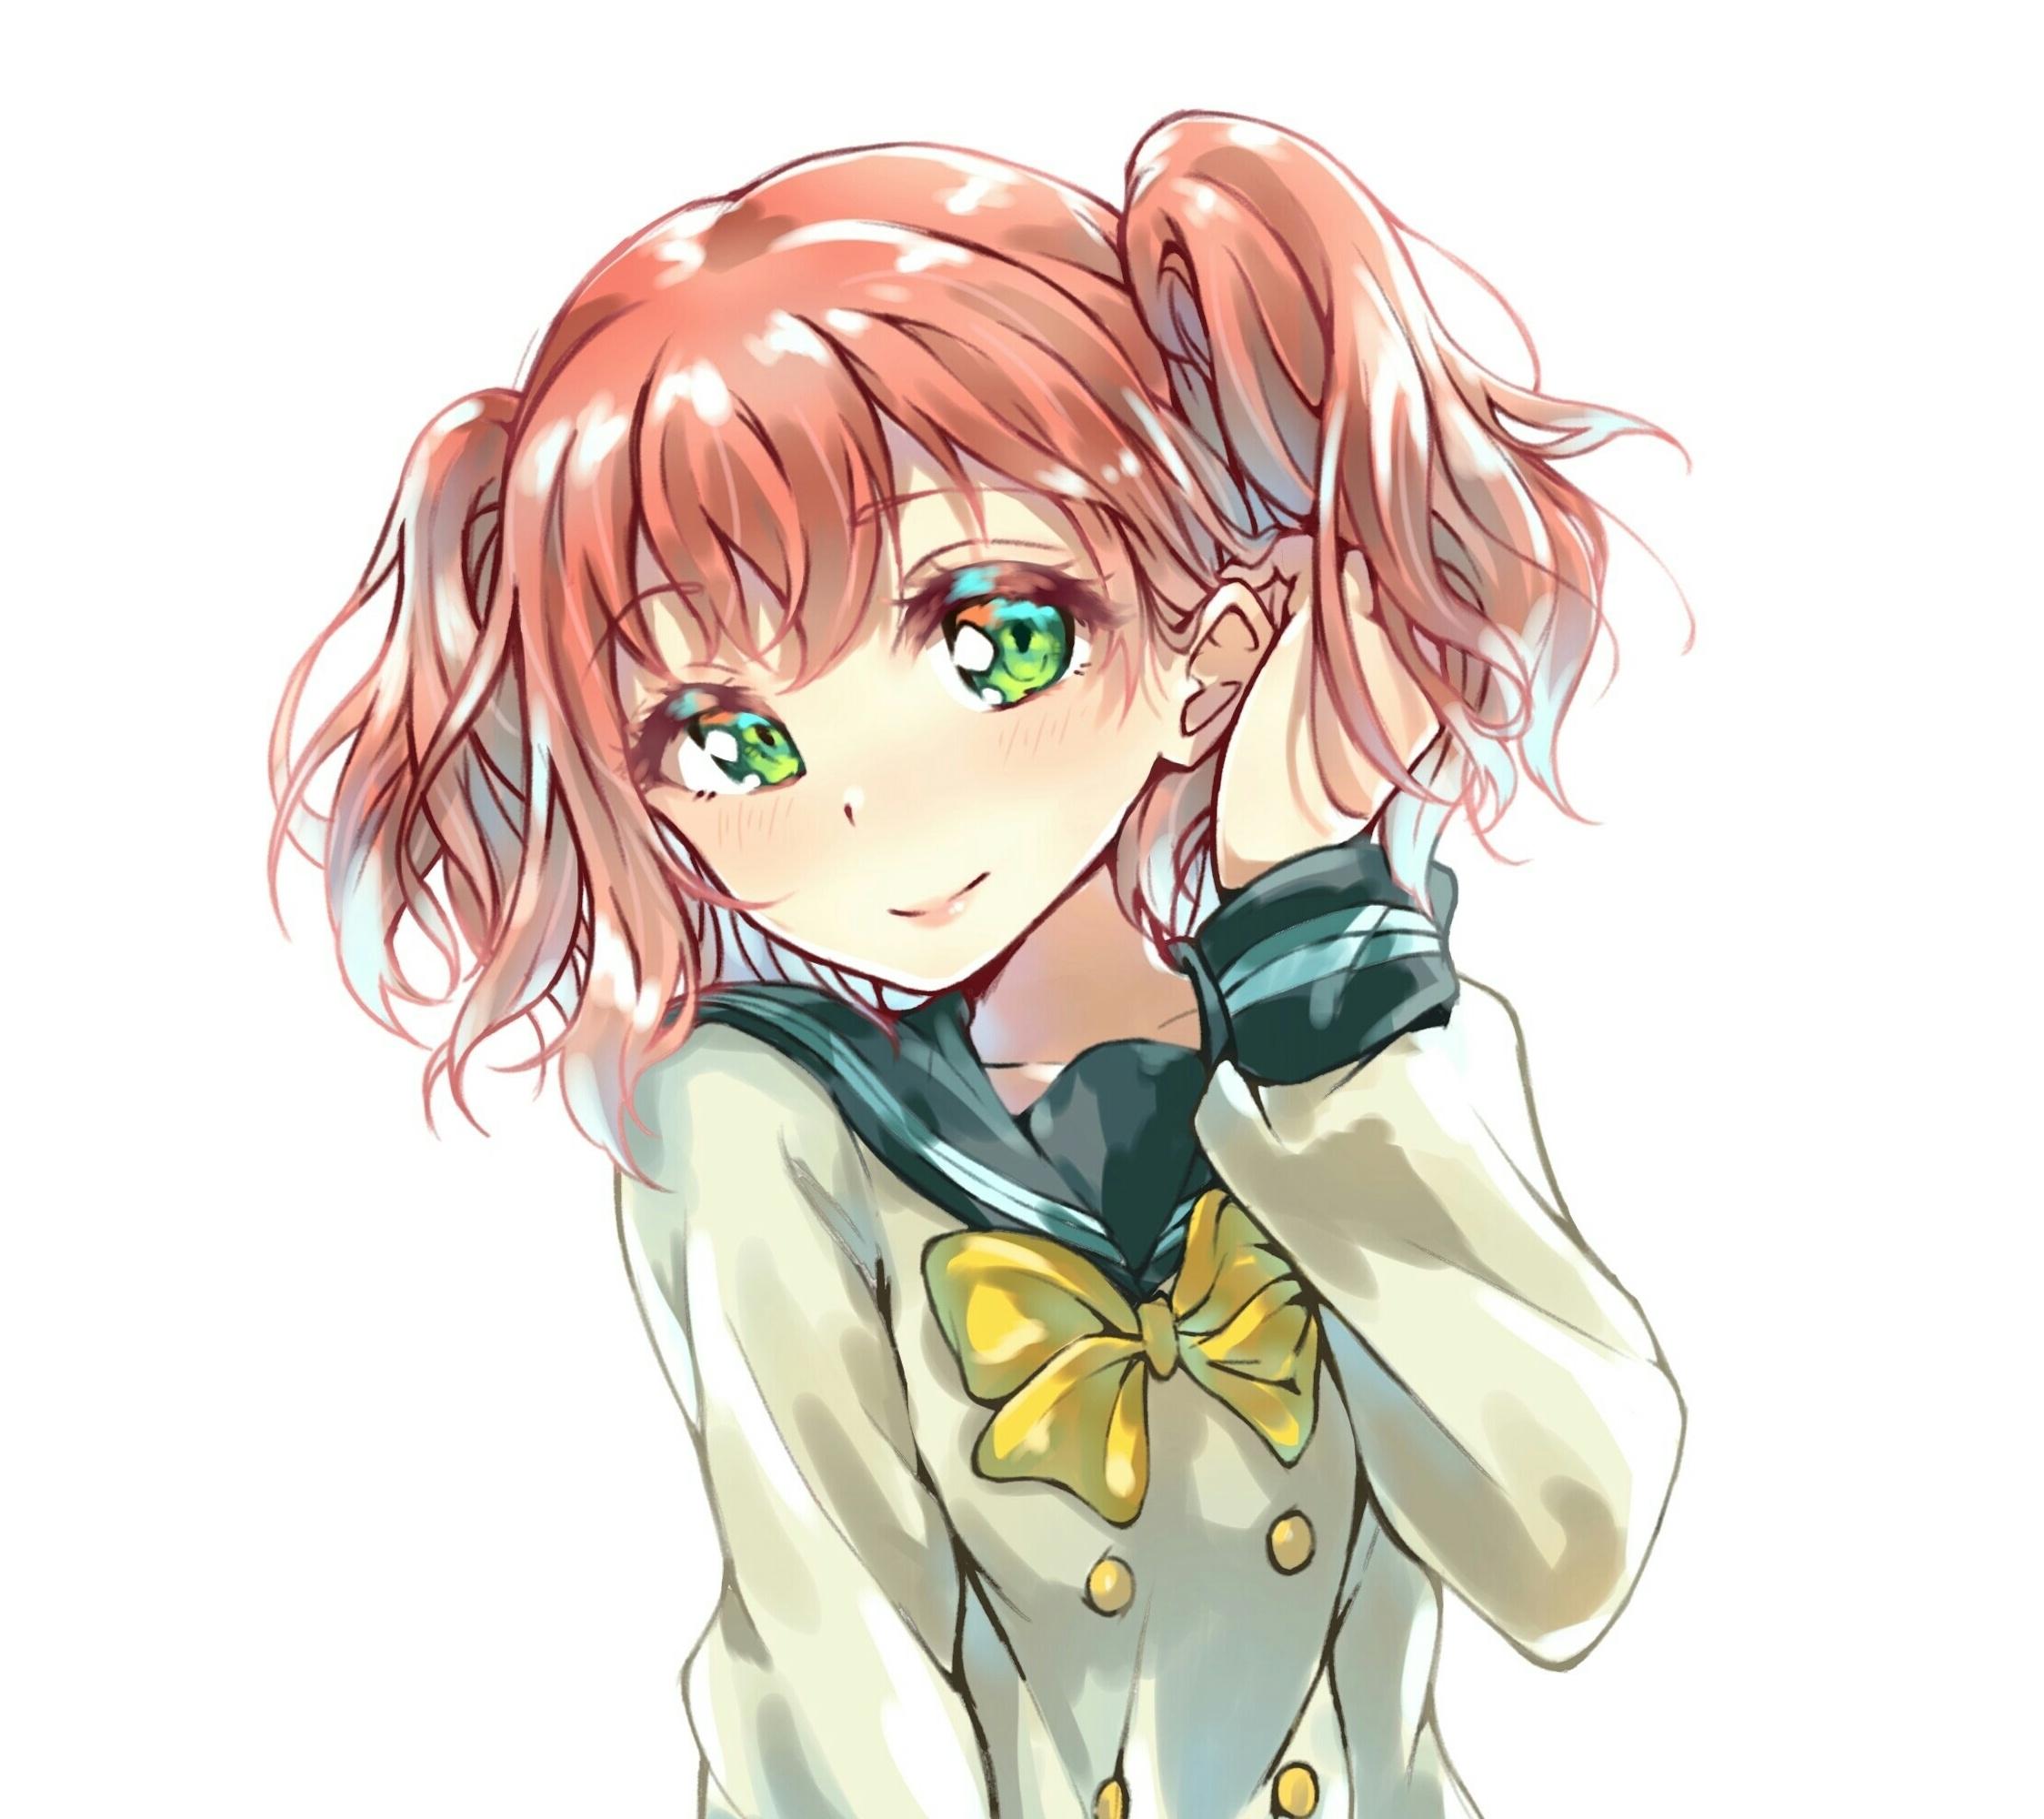 Download 2248x2248 Wallpaper Shy Love Live Ruby Kurosawa Anime